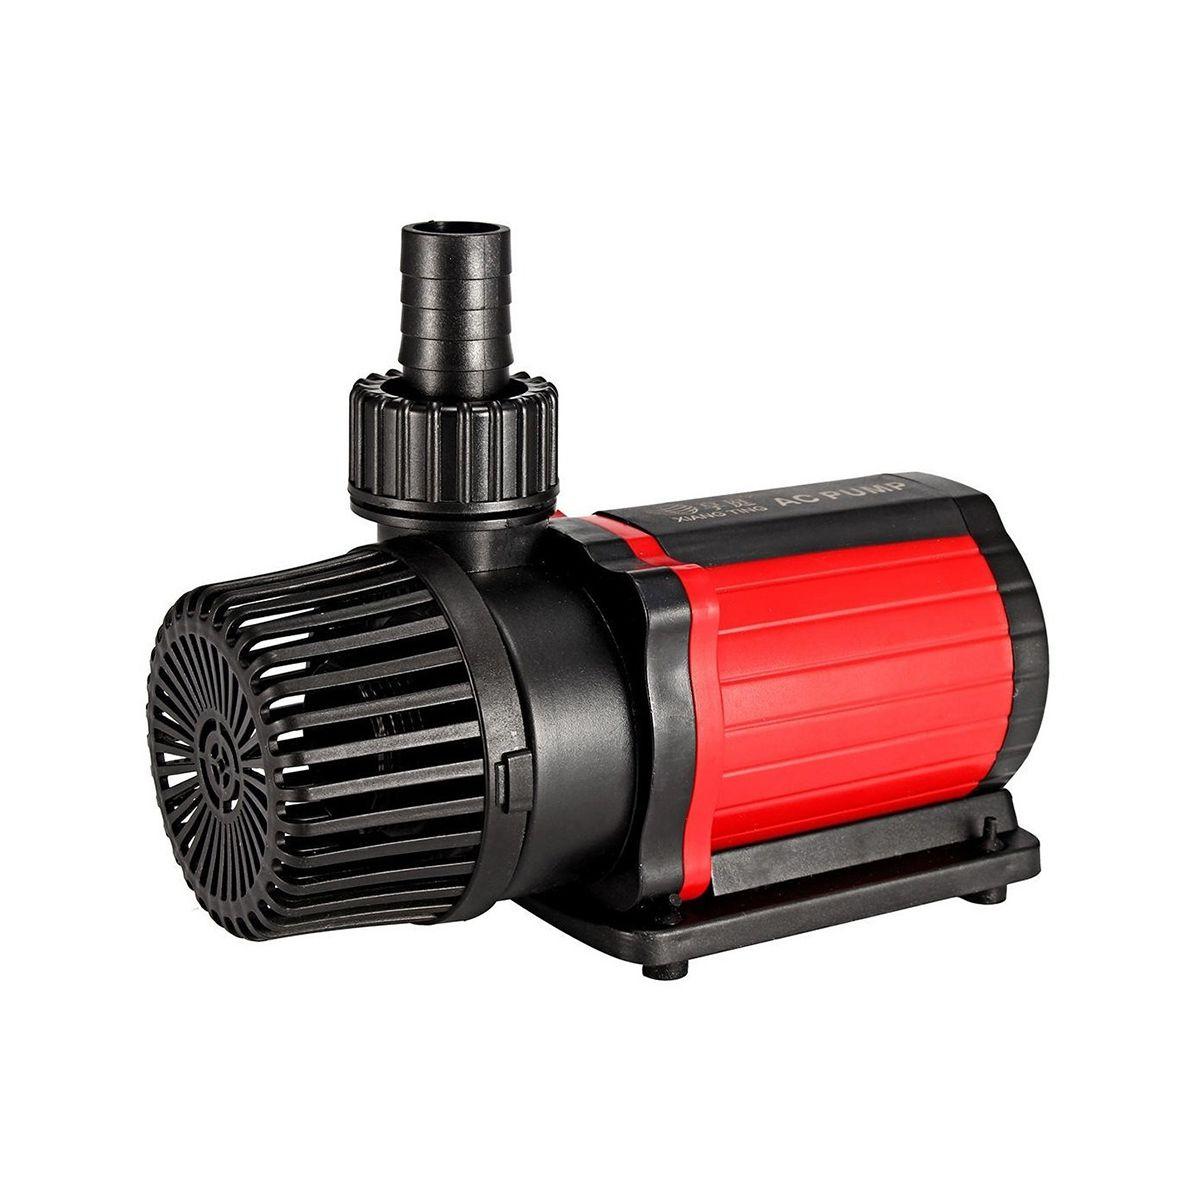 Bomba Ocean Tech Eletrônica Ac-20000 220v